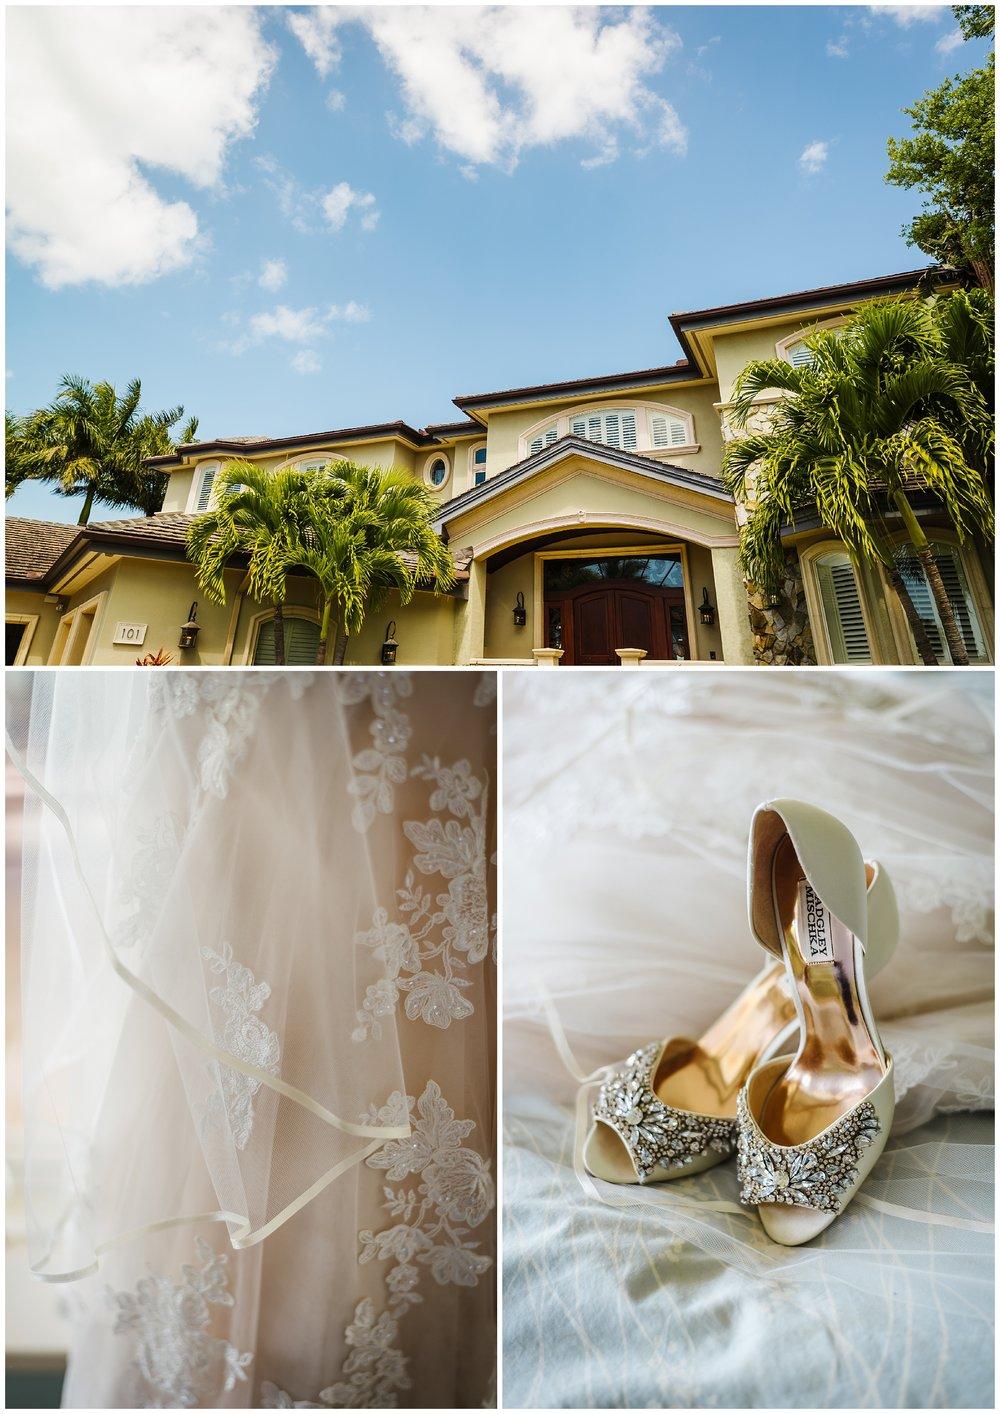 Tampa-wedding-photographer-bella-fleur-orchid-boquet-rsvb-events_0001.jpg